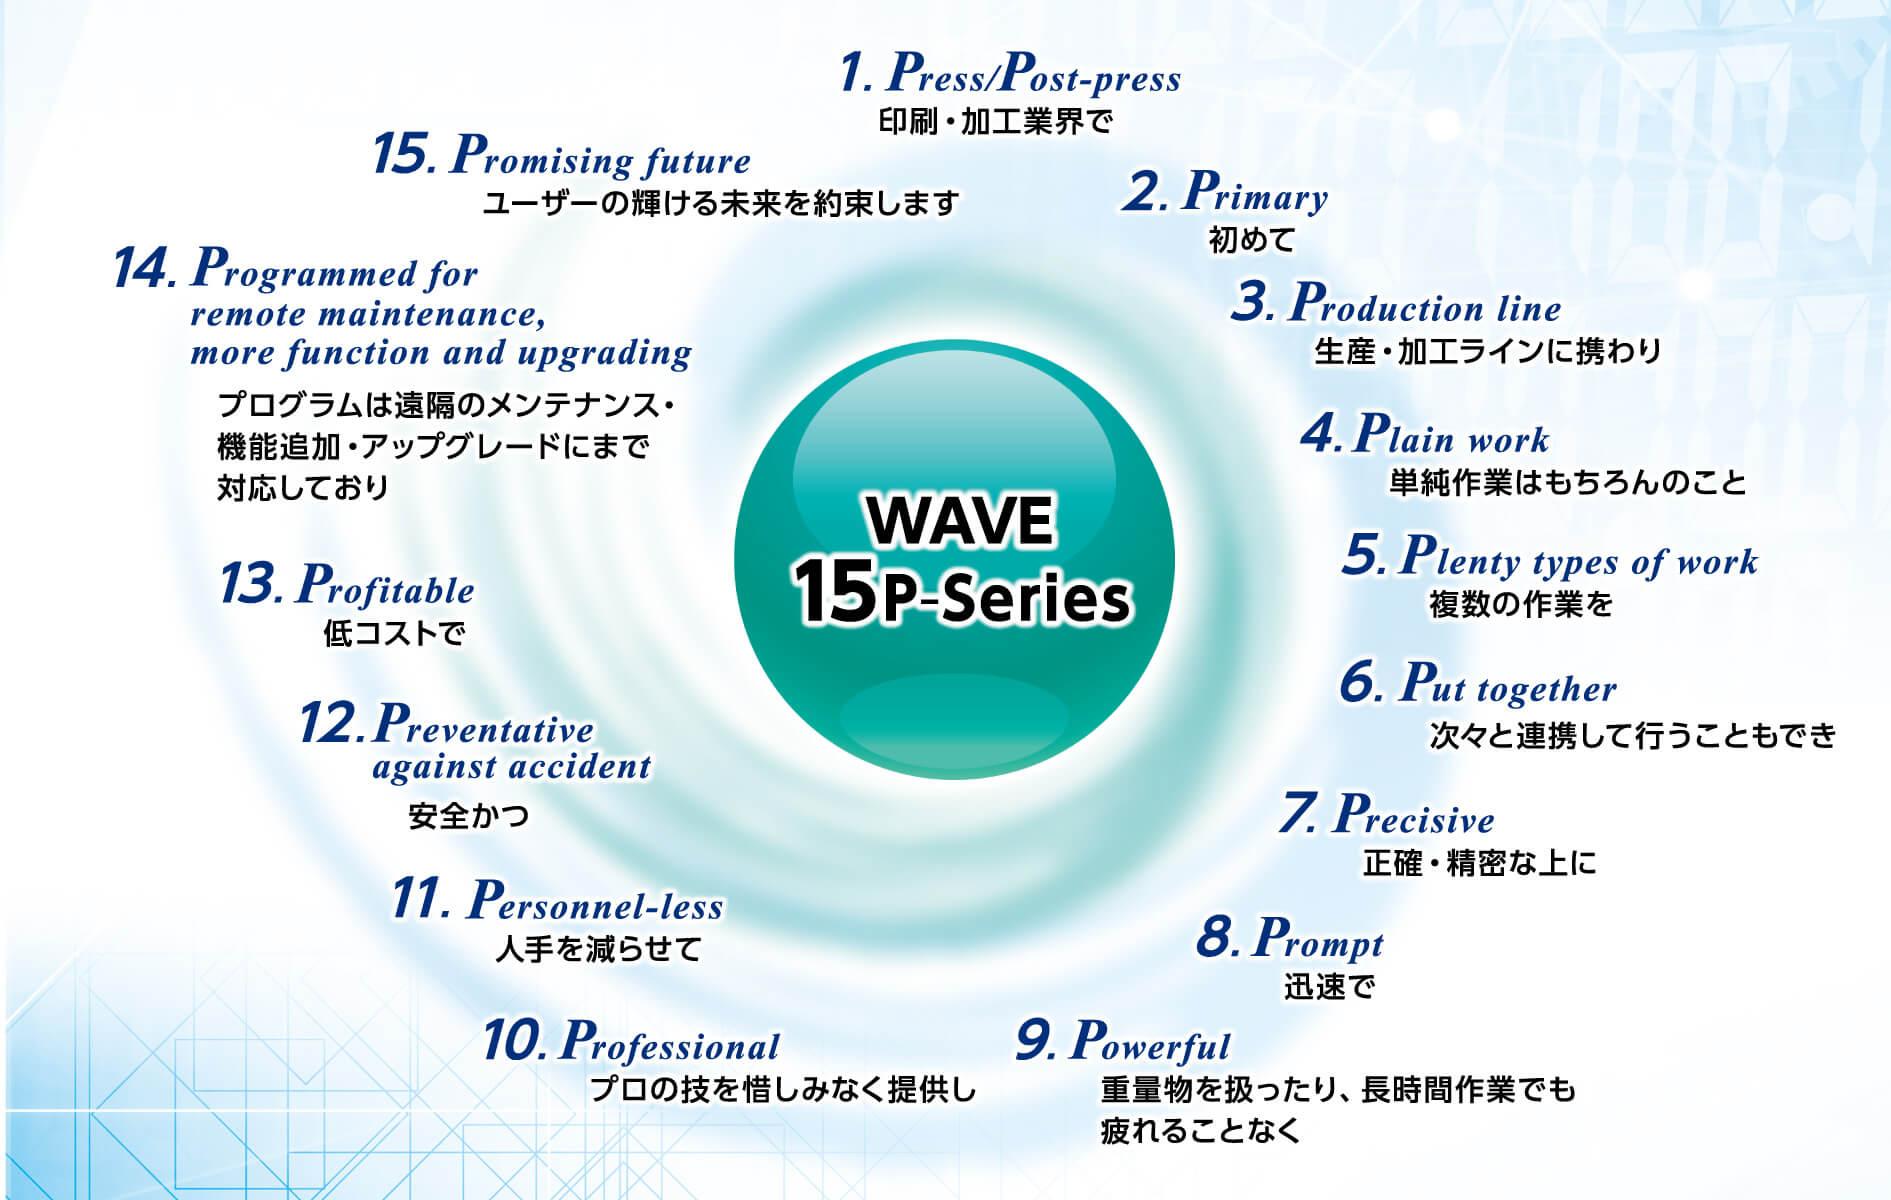 「WAVE 15P-Series」、名前の由来